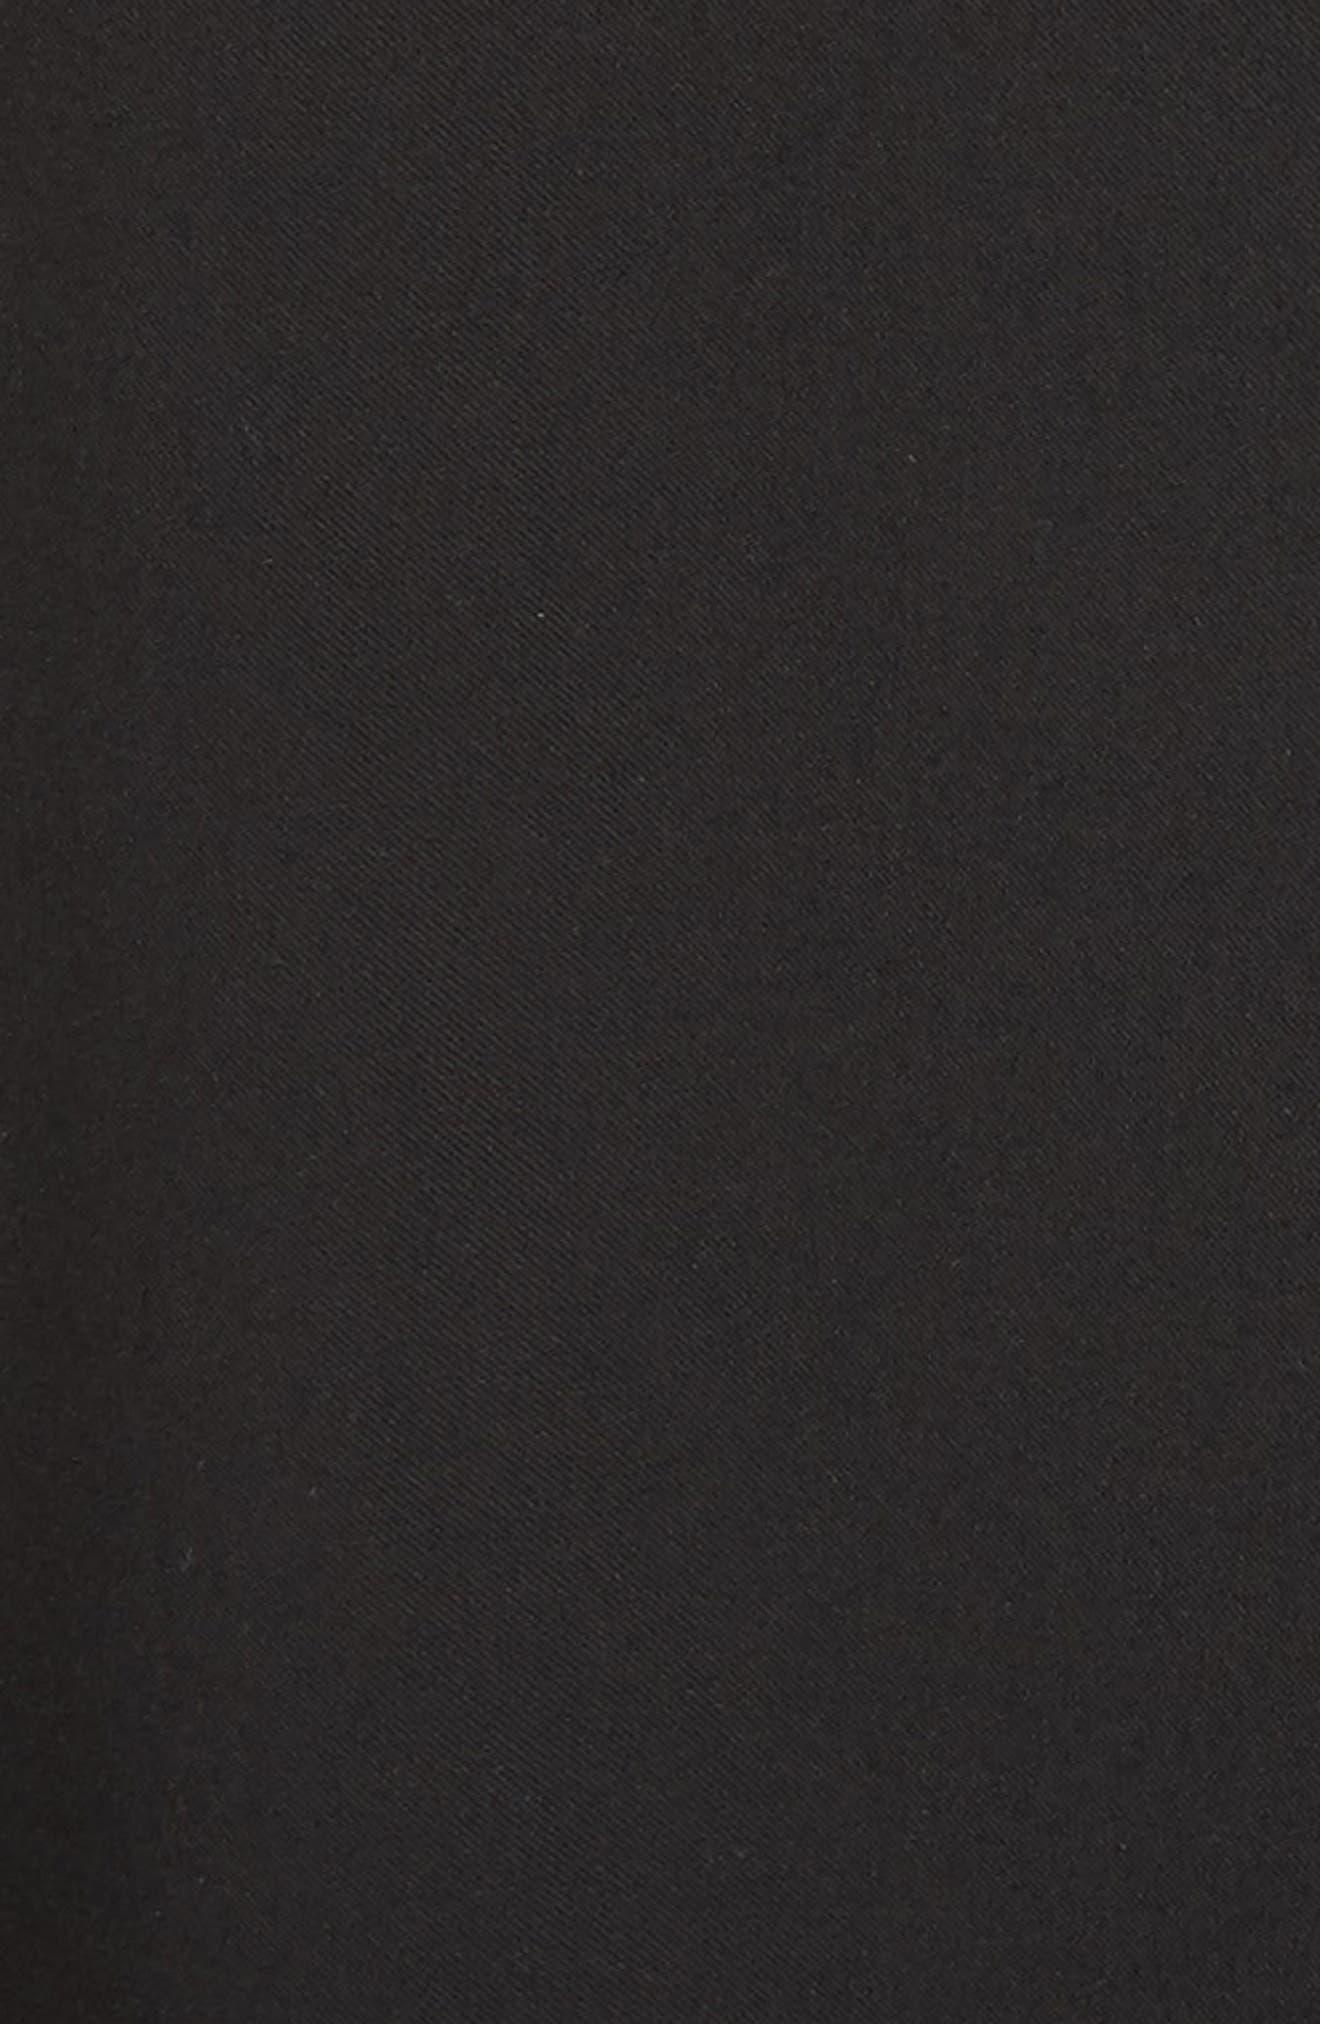 Pleated Faux Leather Trim Skirt,                             Alternate thumbnail 5, color,                             Black